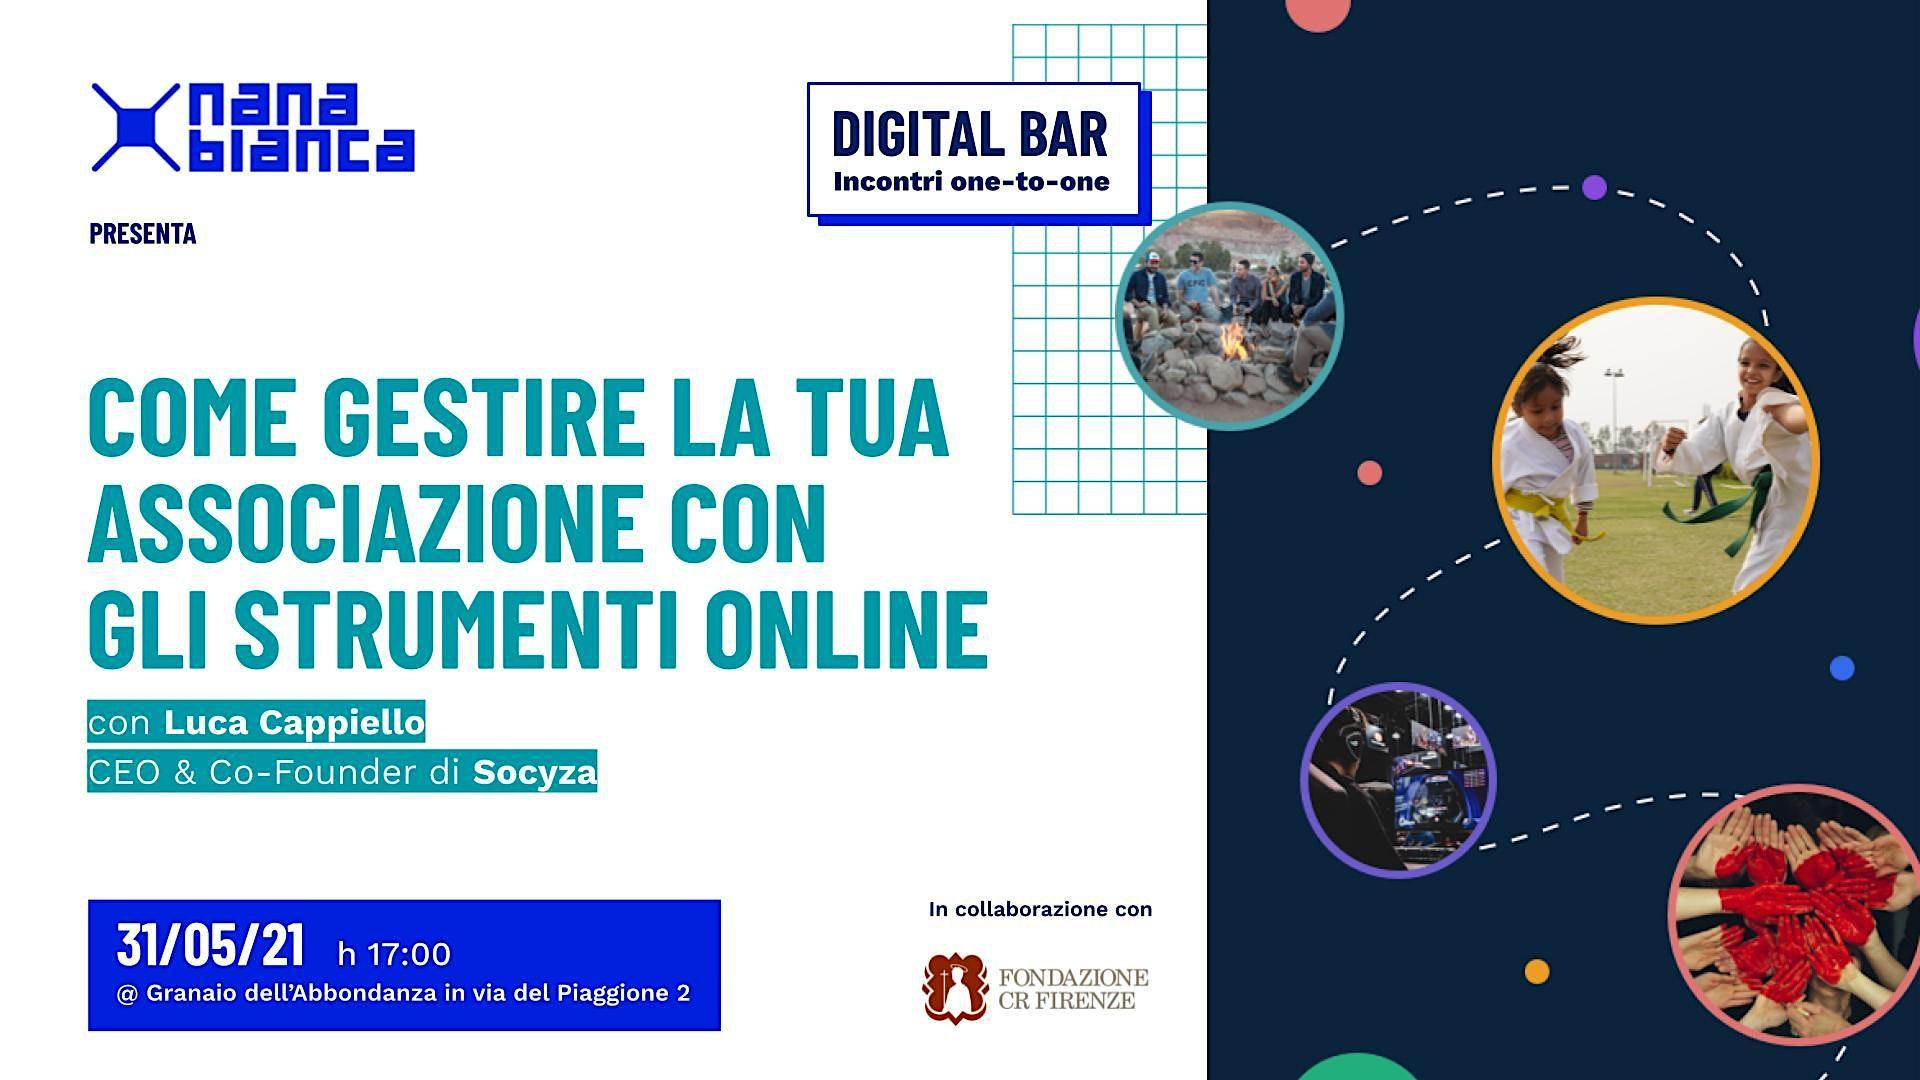 Digital Bar: Gestisci la tua associazione online